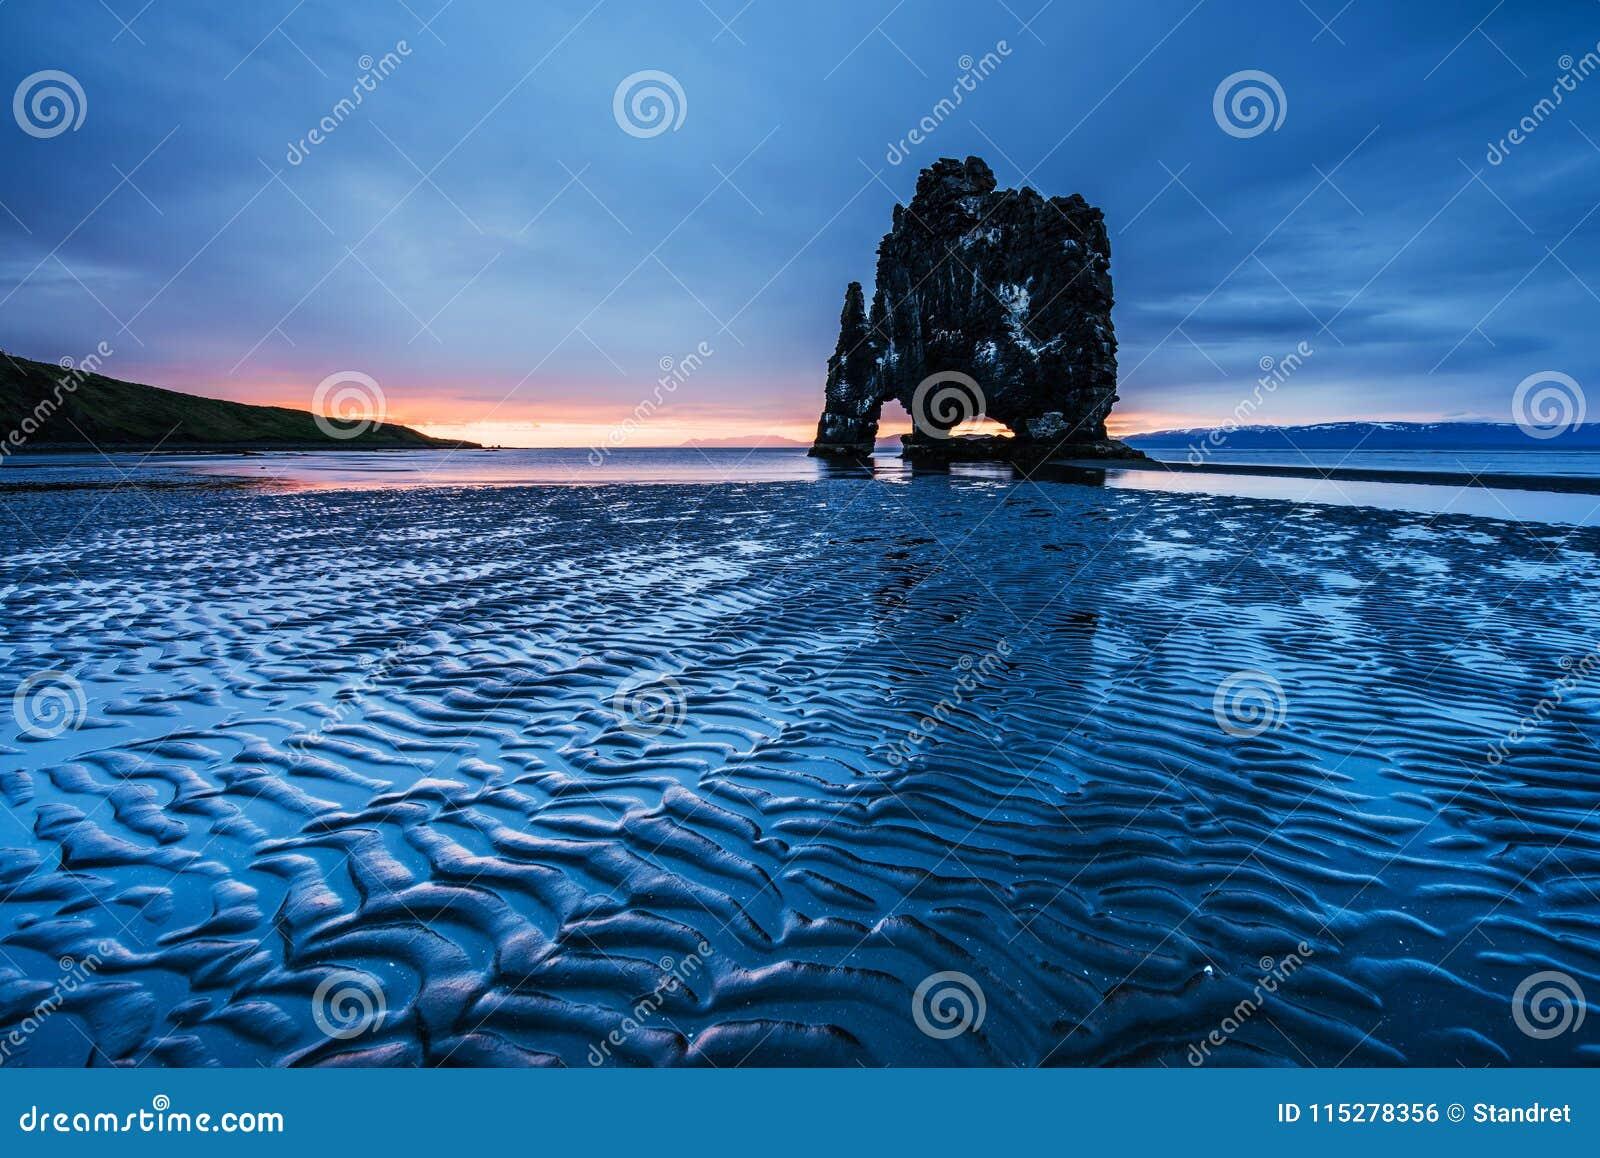 Hvitserkur 15 m高度 是一个壮观的岩石在冰岛的北海岸的海 在这张照片Hvitserkur